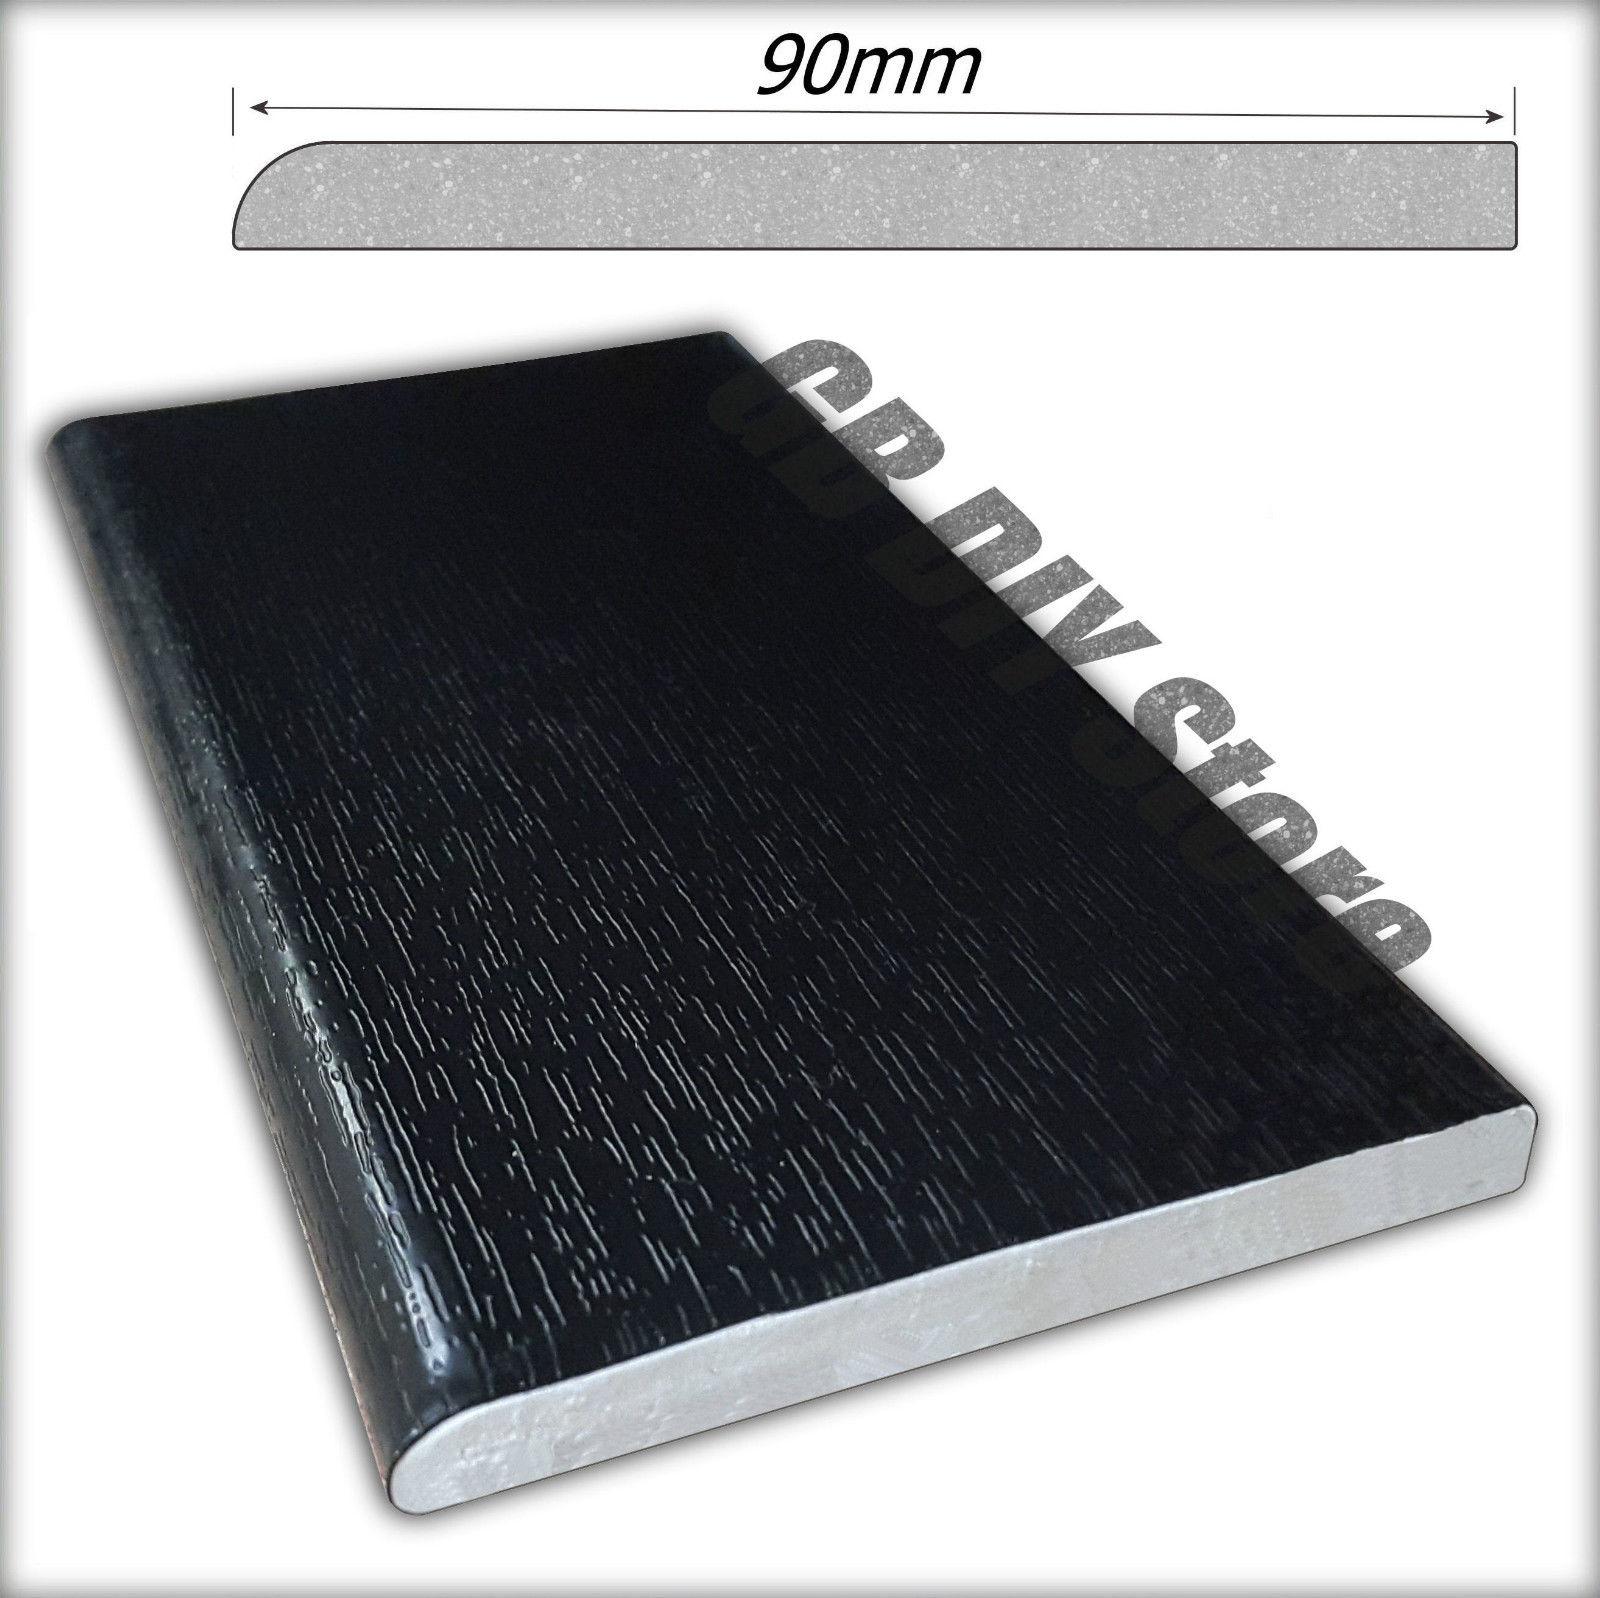 Upvc Window And Door Trim Plastic Architrave Black Pvc 5m